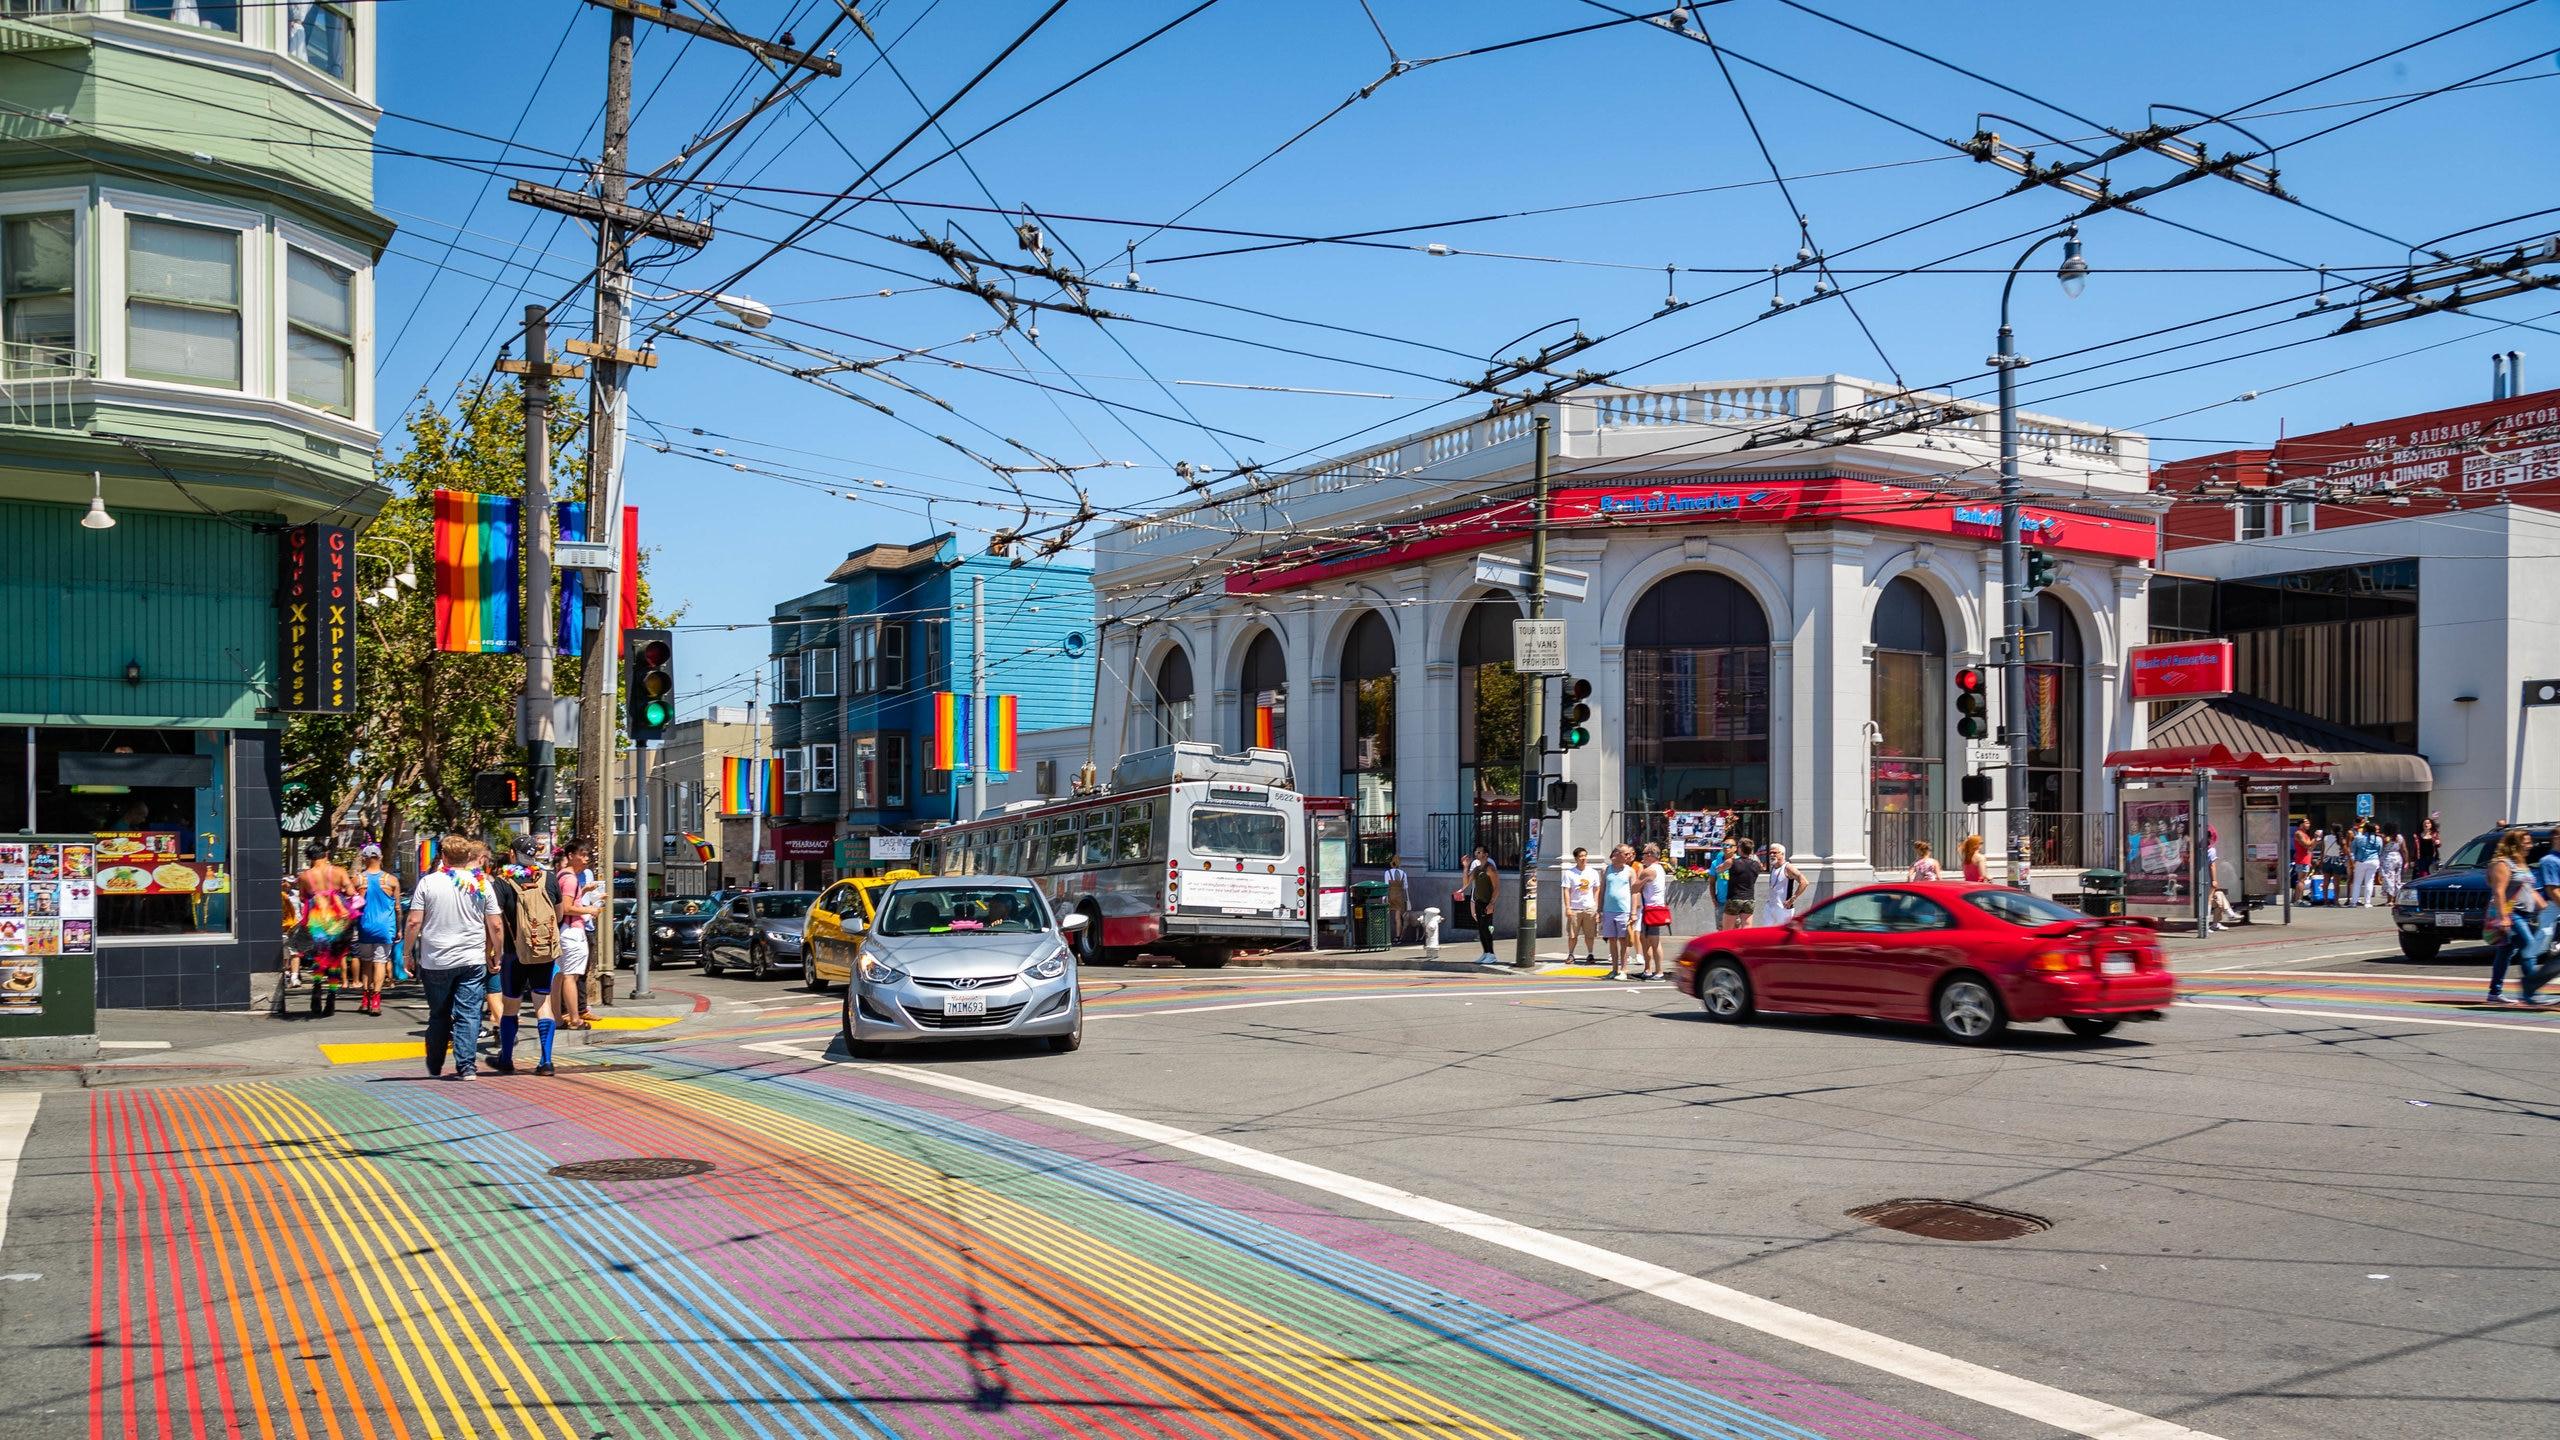 Eureka Valley, San Francisco, California, United States of America